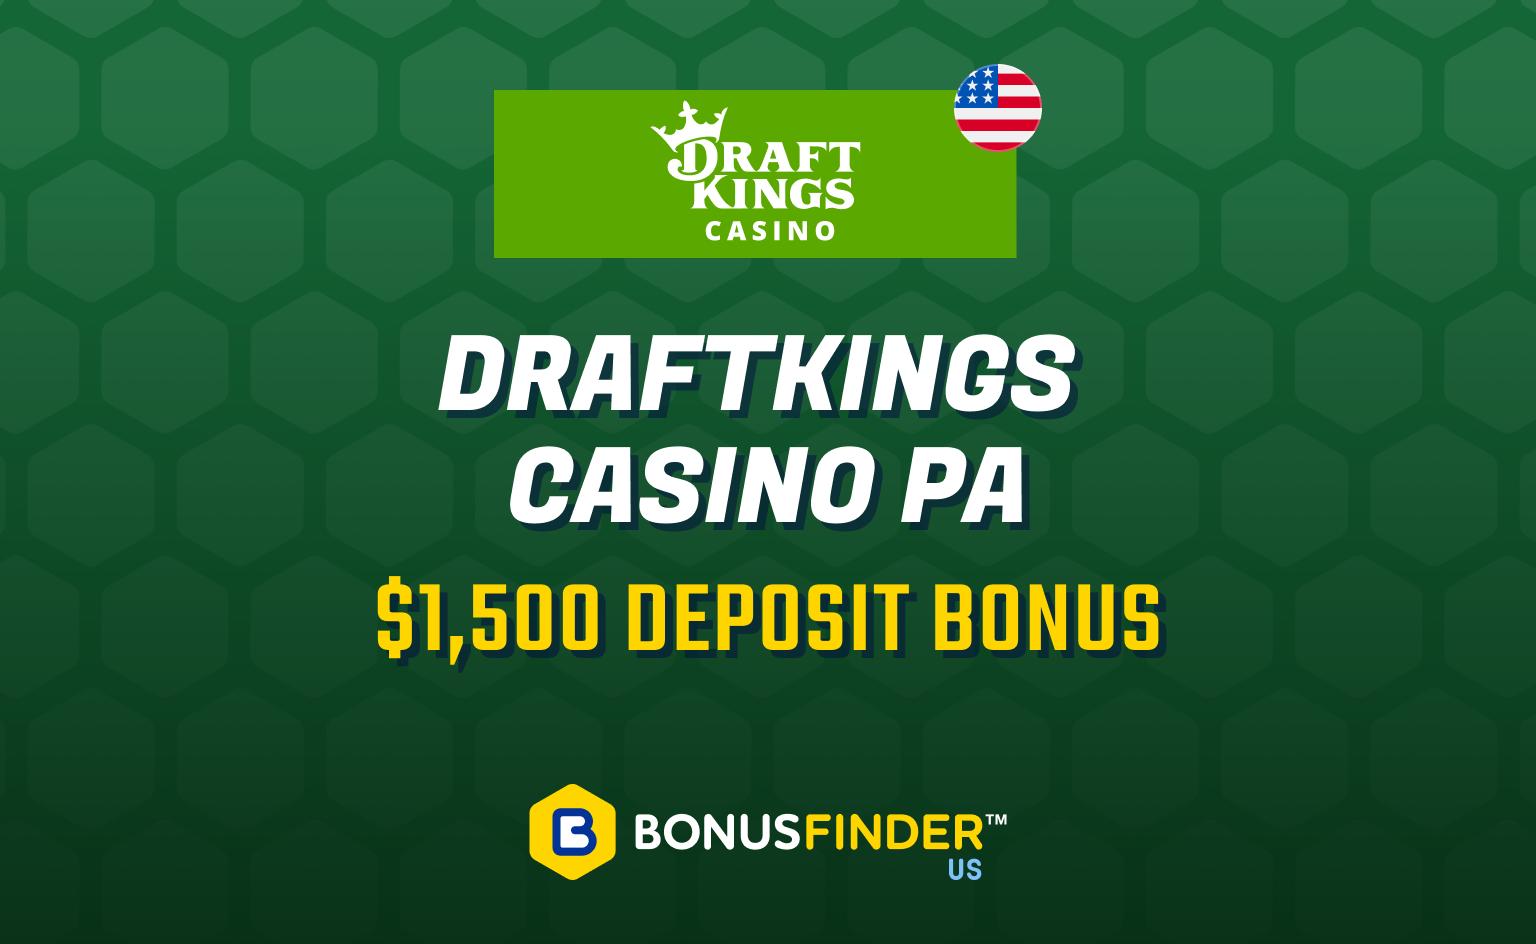 DraftKings Casino PA promo code